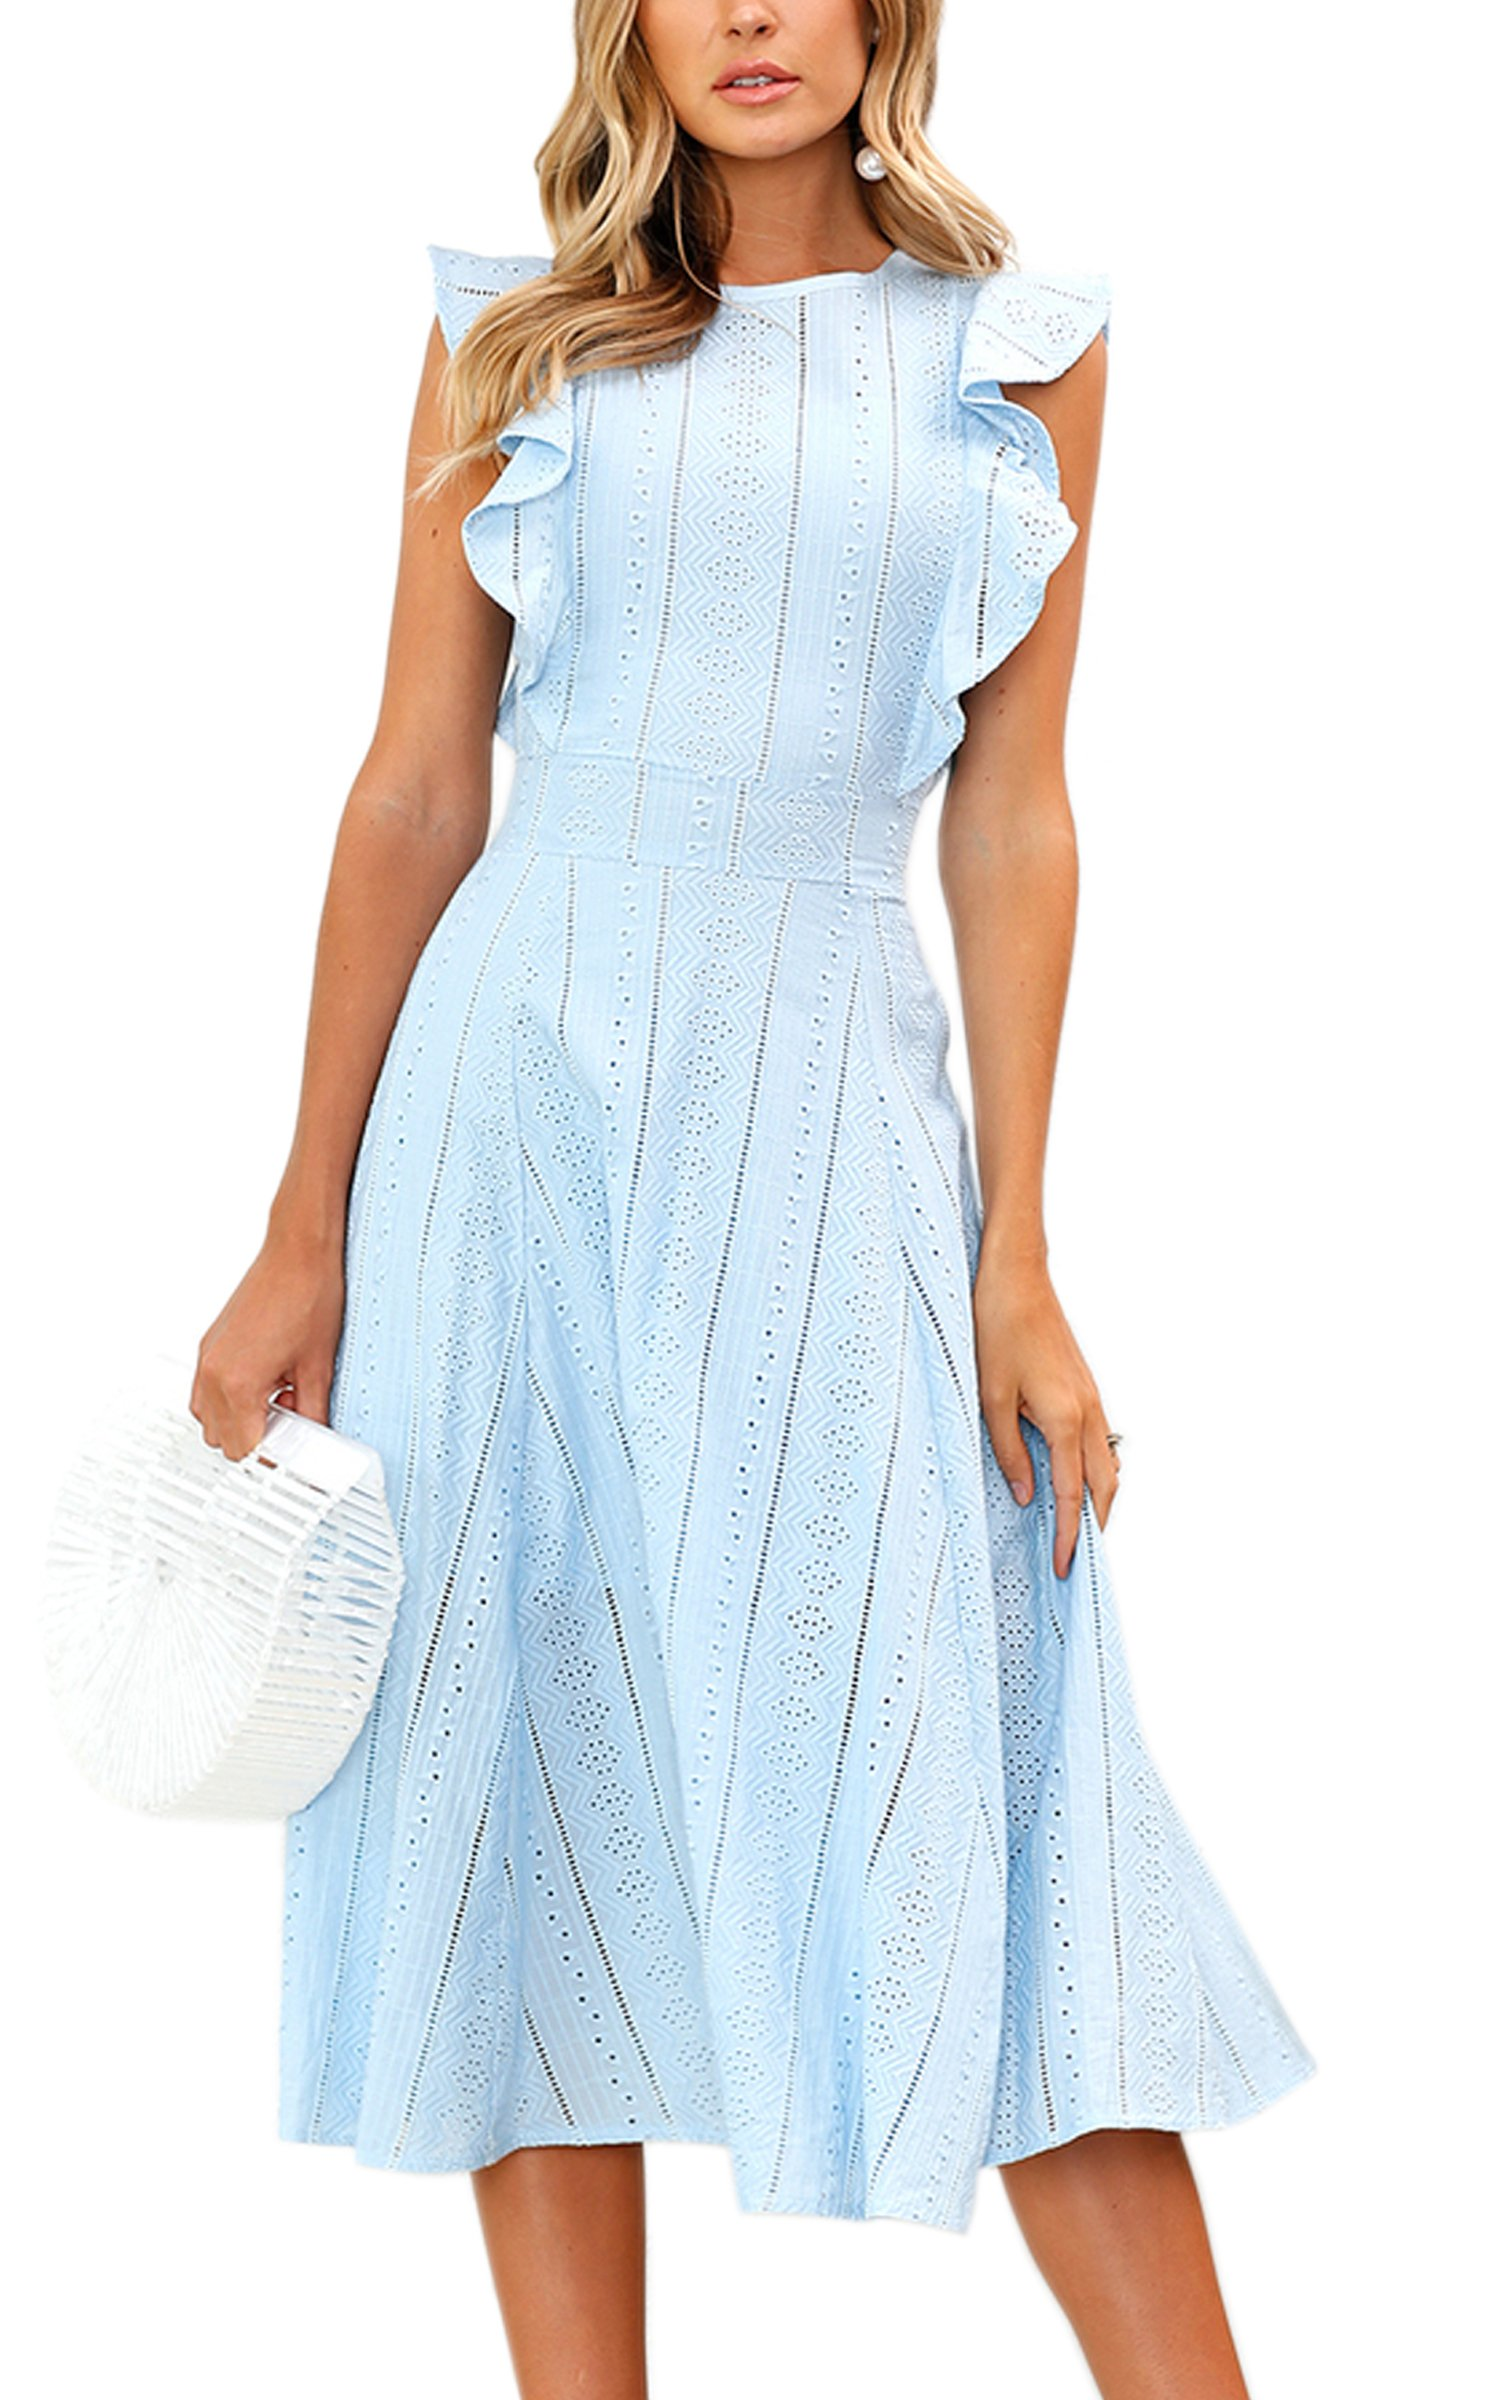 ECOWISH Womens Dresses Elegant Ruffles Cap Sleeves Summer A-Line Midi Dress Blue S